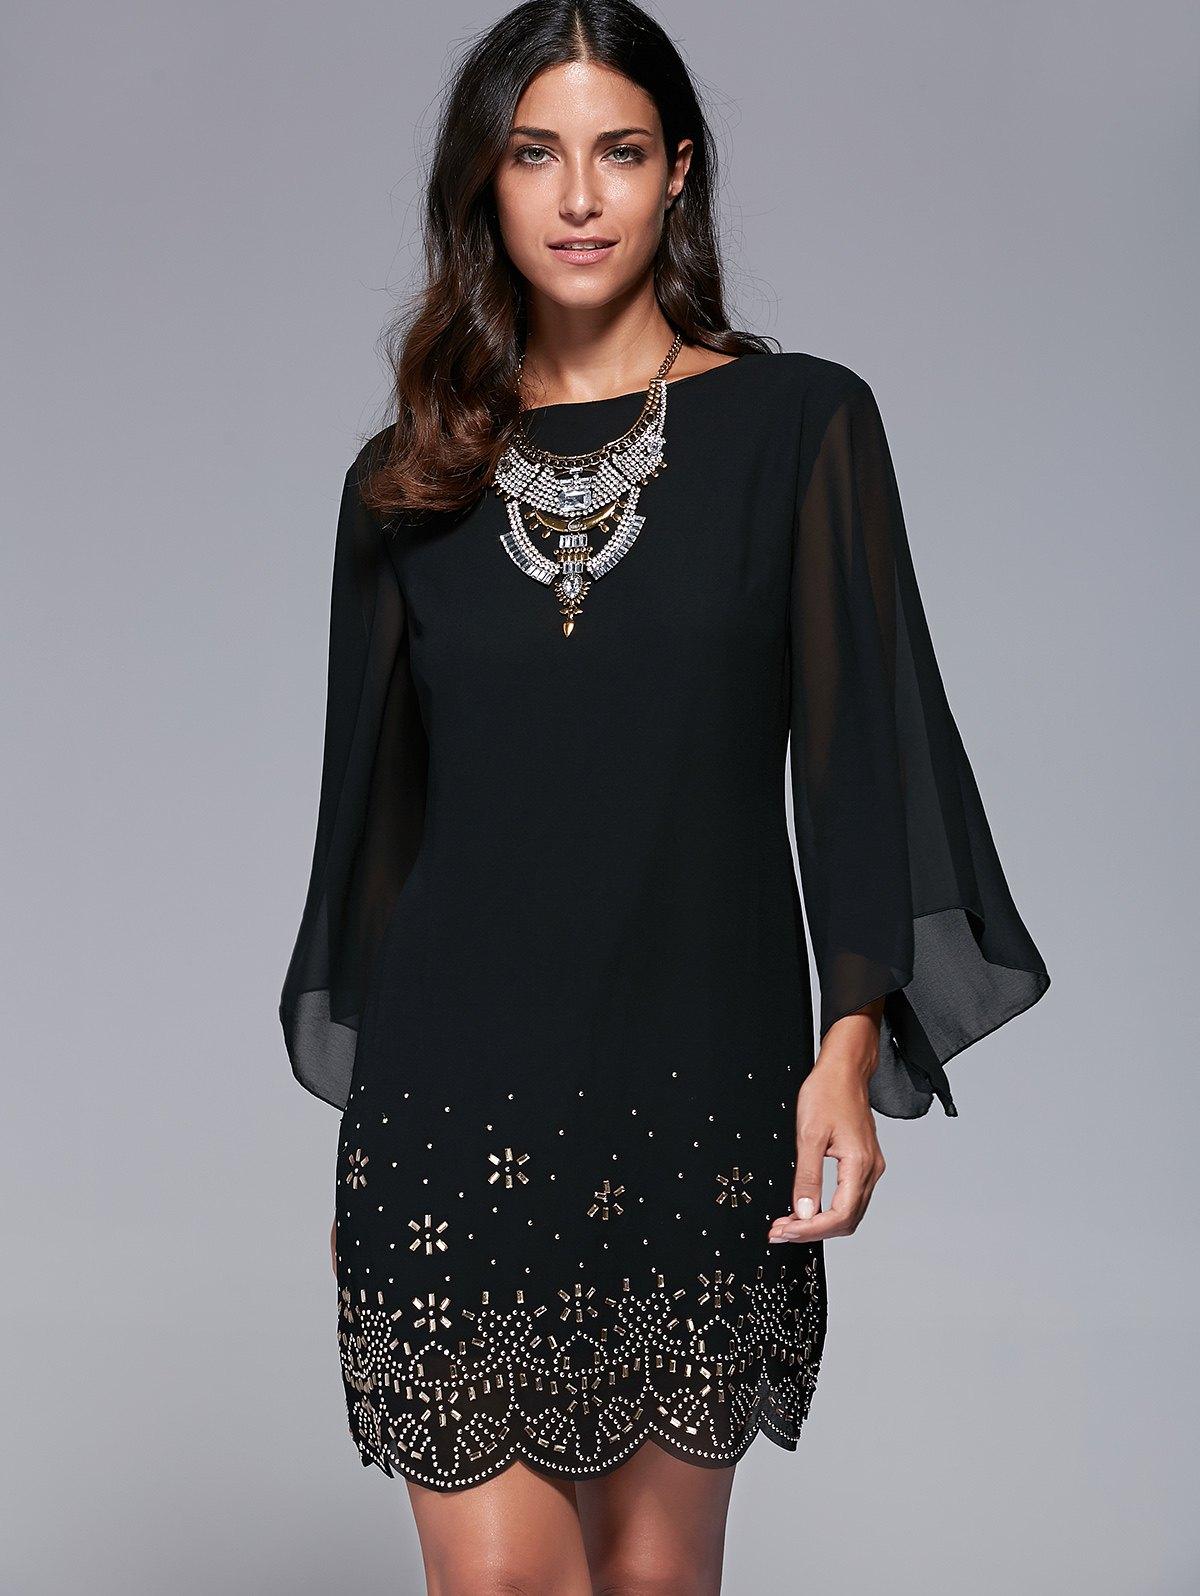 Ways Of Wearing A Plus Size Dress Careyfashion